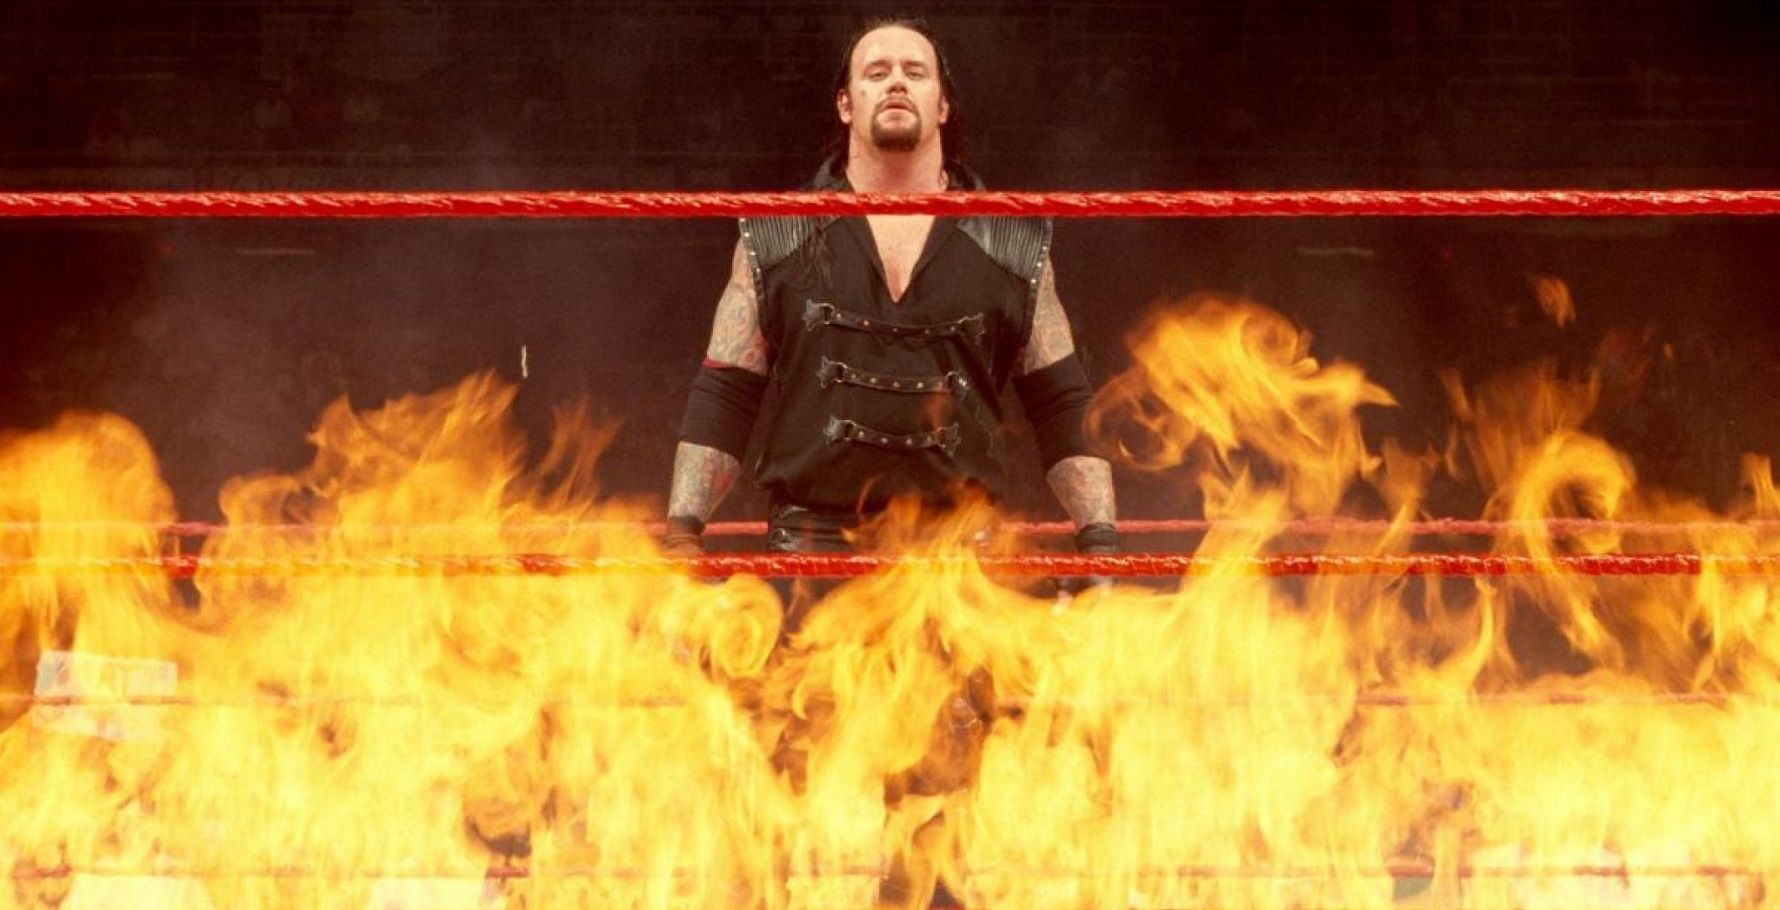 Greatest Royal Rumble Matches: Shawn Michaels vs. Undertaker Casket Match